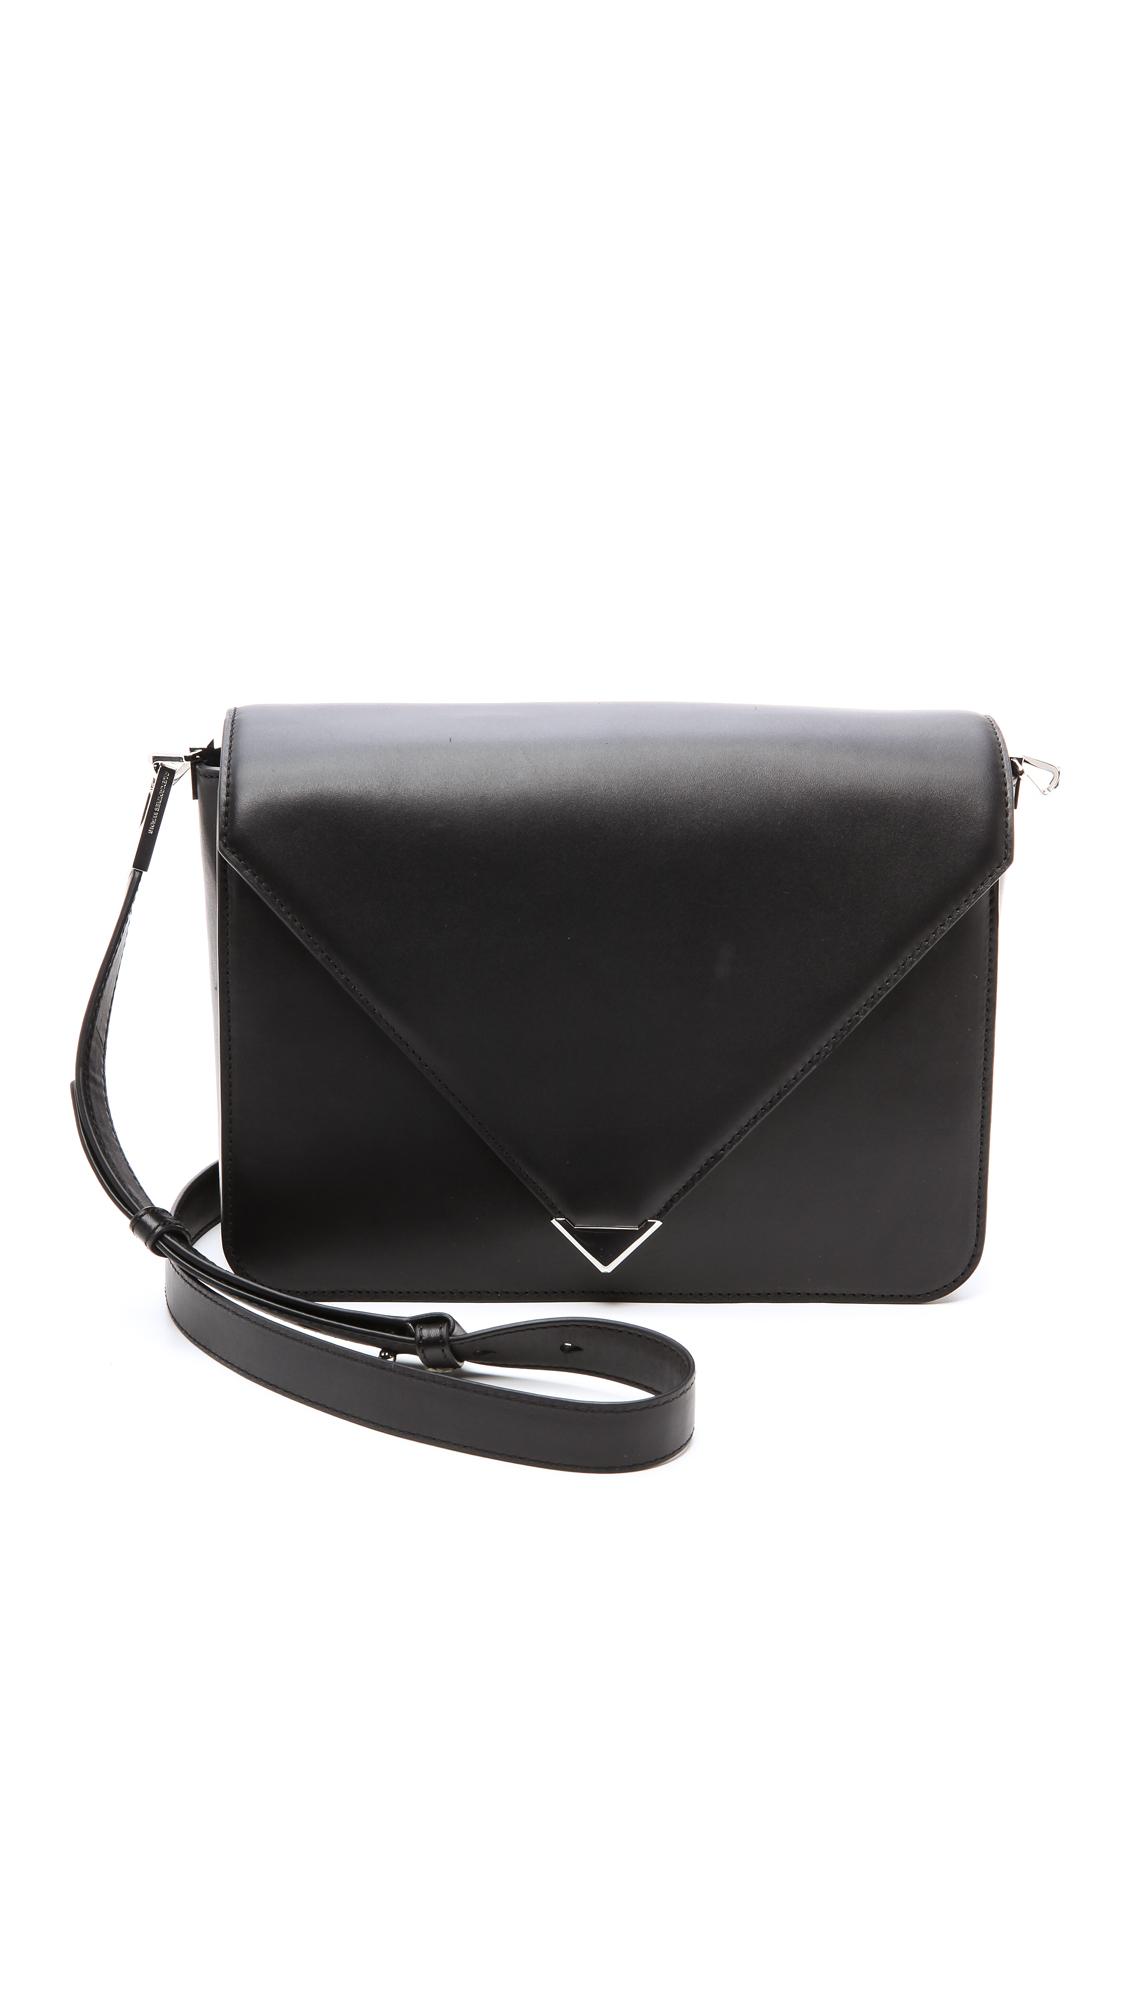 35add34e47ed2 Buy alexander wang Prisma Envelope Large Sling Bag (black ...